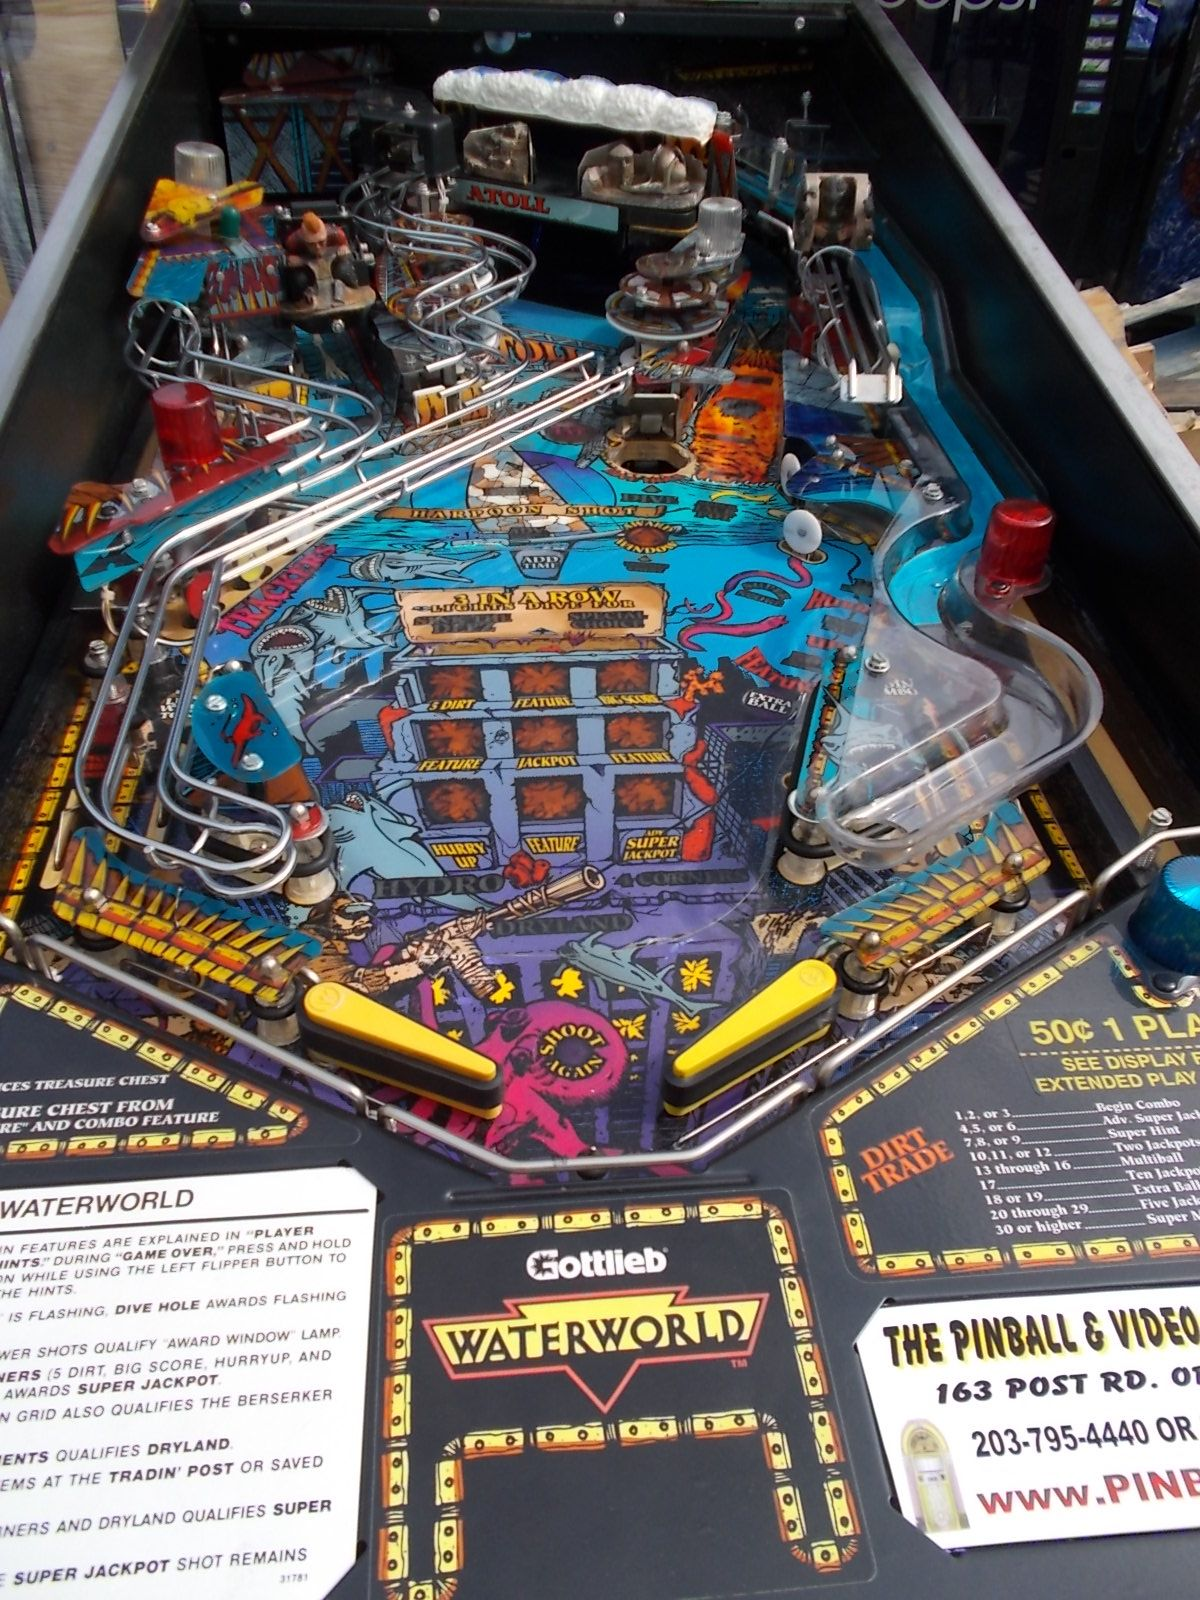 Waterworld pinball machine game for sale by gottlieb 15